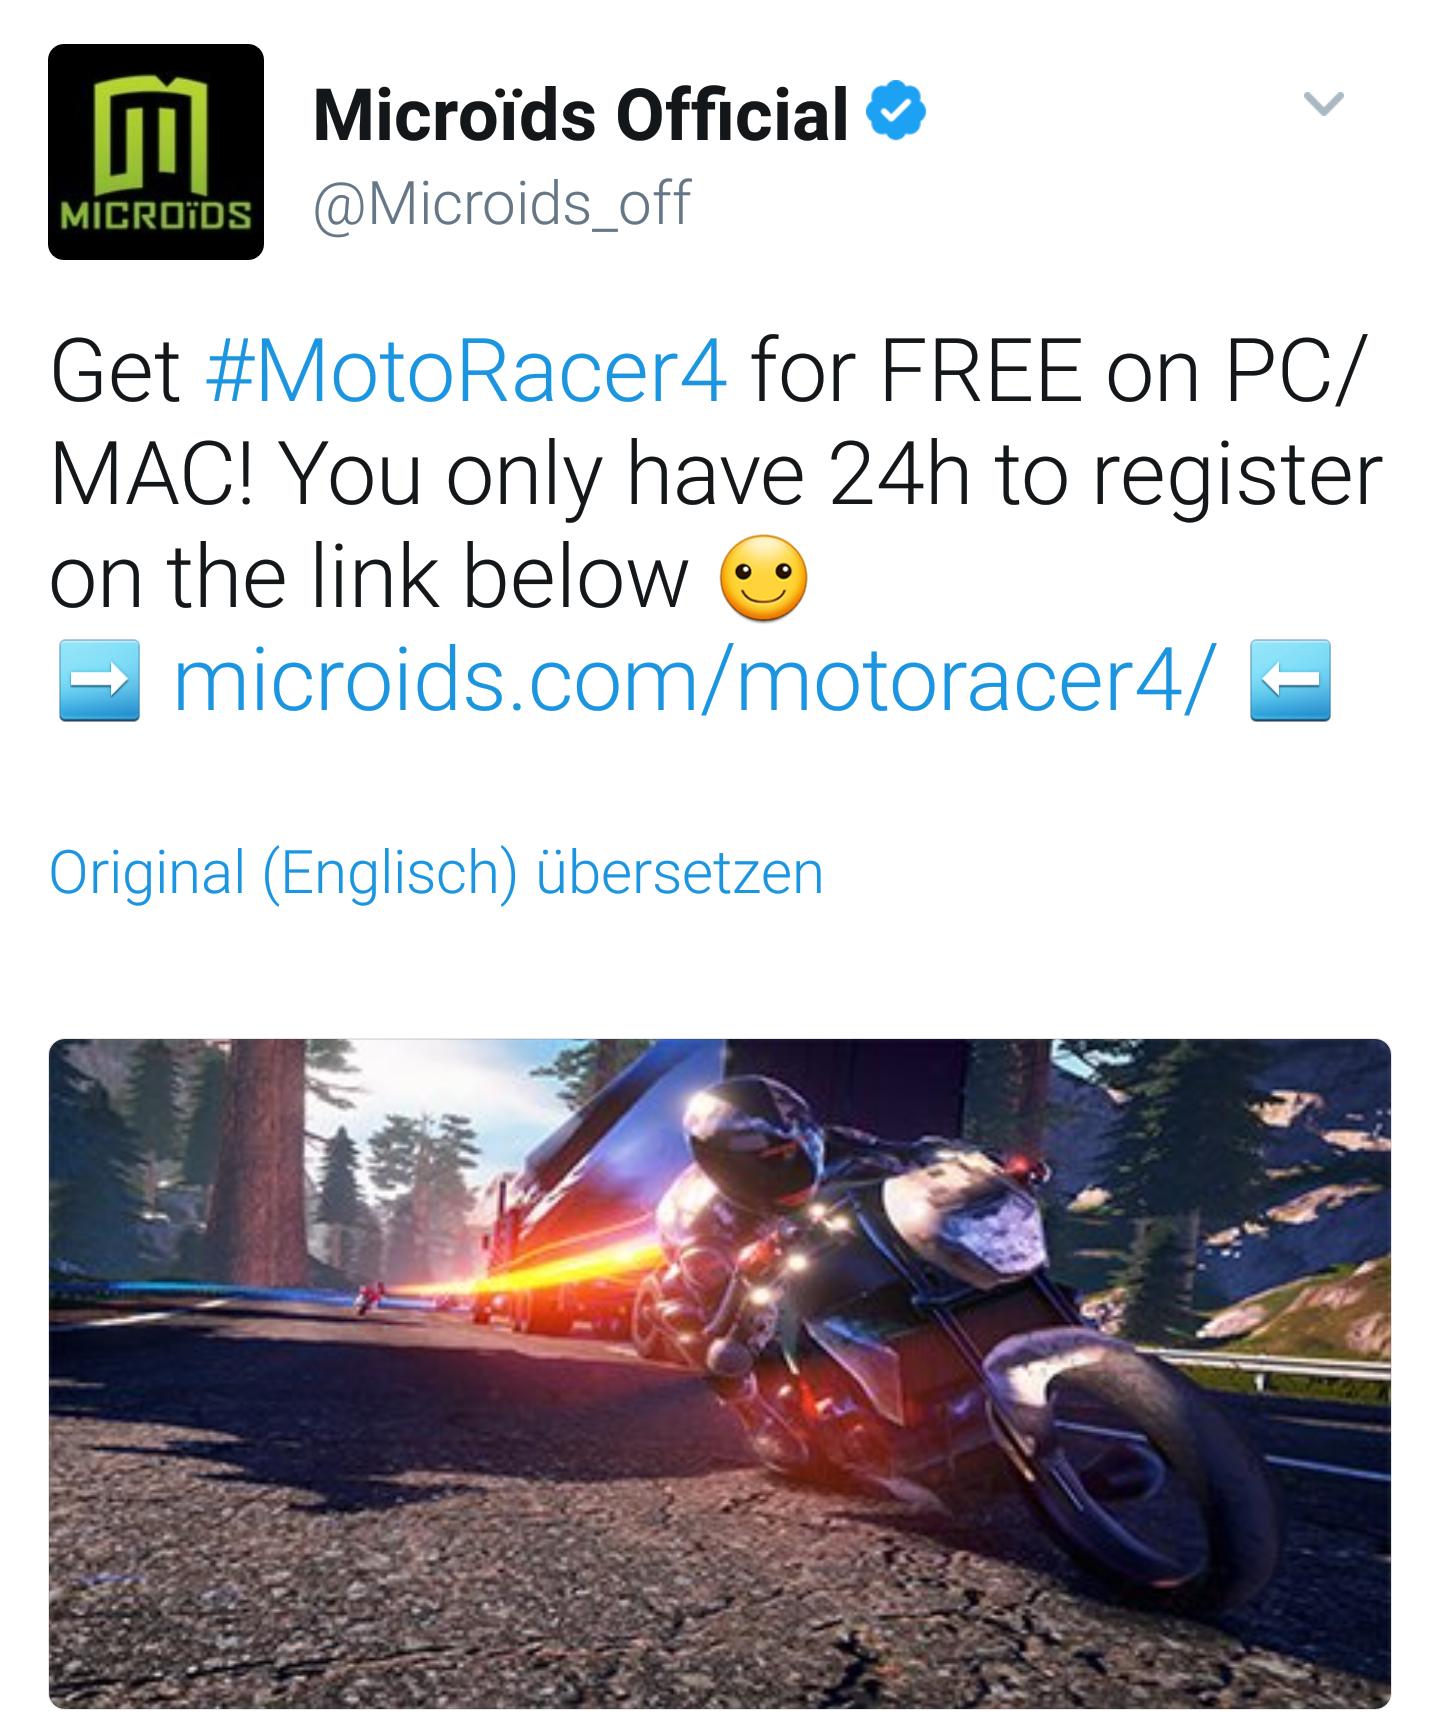 Moto Racer 4 (PC/Mac) kostenlos!